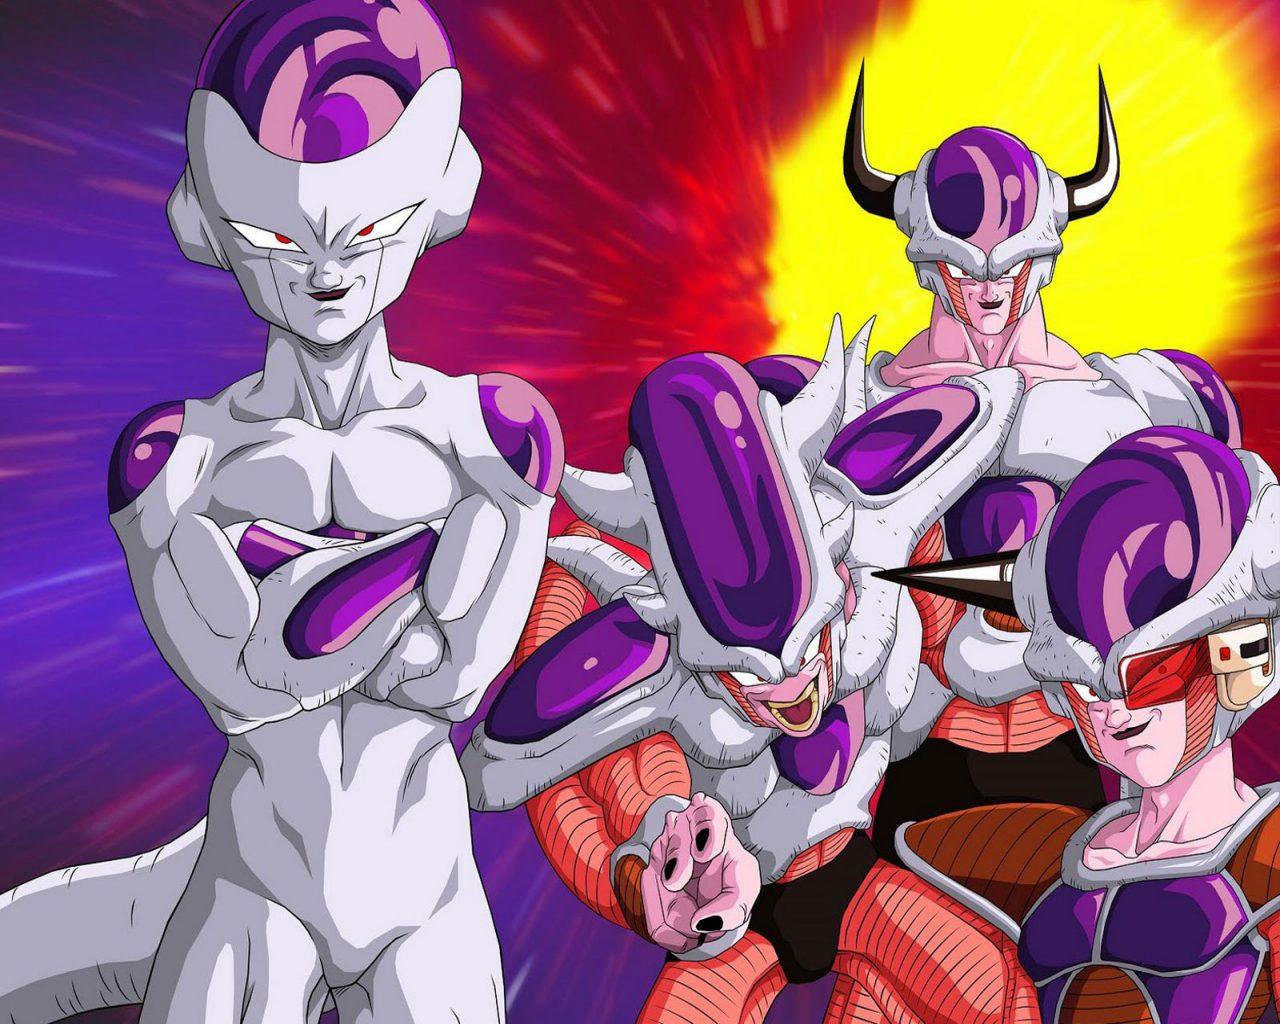 Dragon Ball z Frieza Transformation Frieza Dragon Ball z